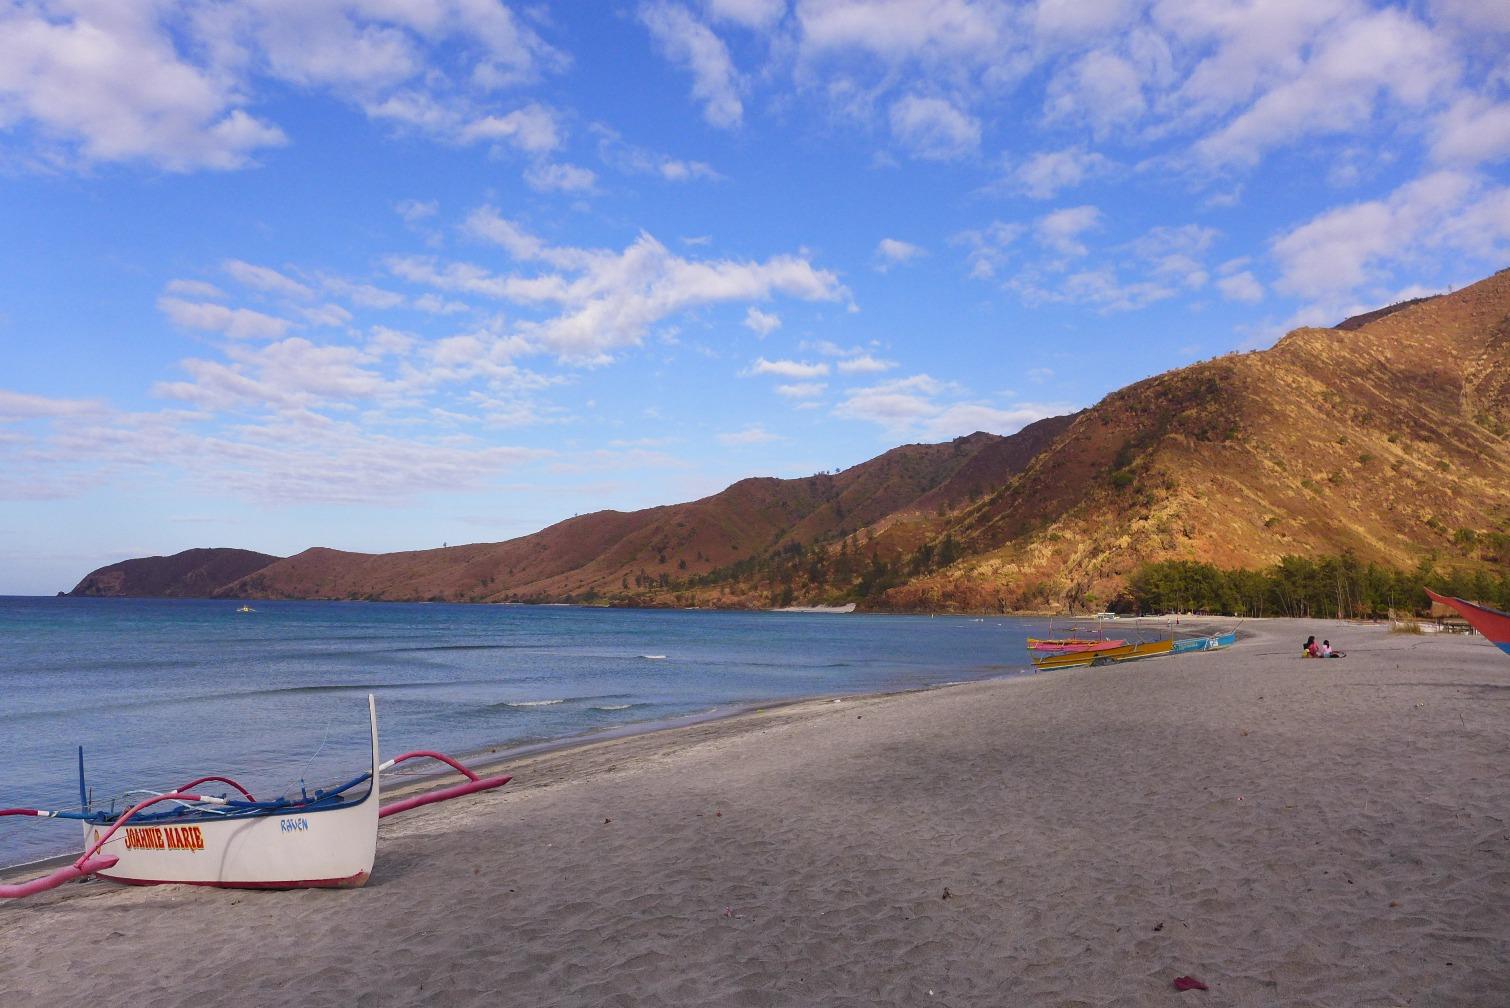 D.I.Y. Camping at Nagsasa Cove; Anawangin itinerary; What to do in Zambales; Weekend Getaway from Manila